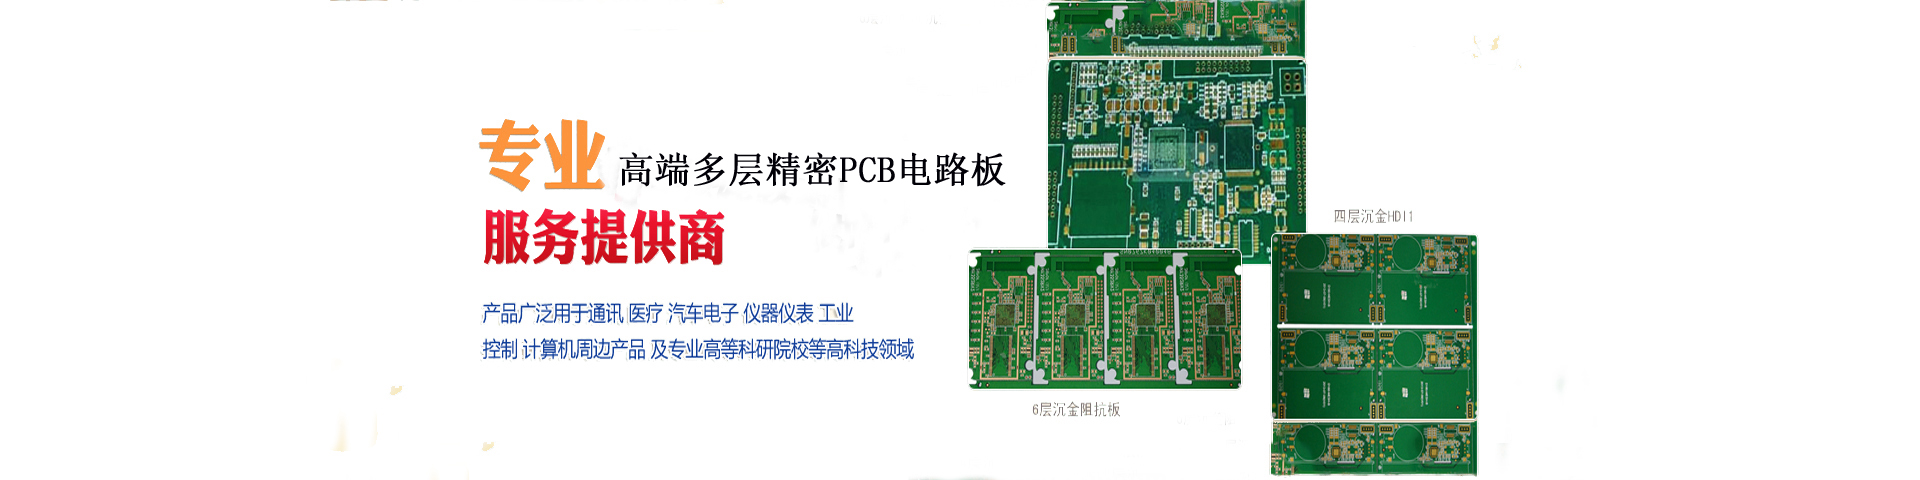 beat365娱乐官网,beat365娱乐官网,电路板打样,PCB打样,电路板,PCB生产,PCB制造